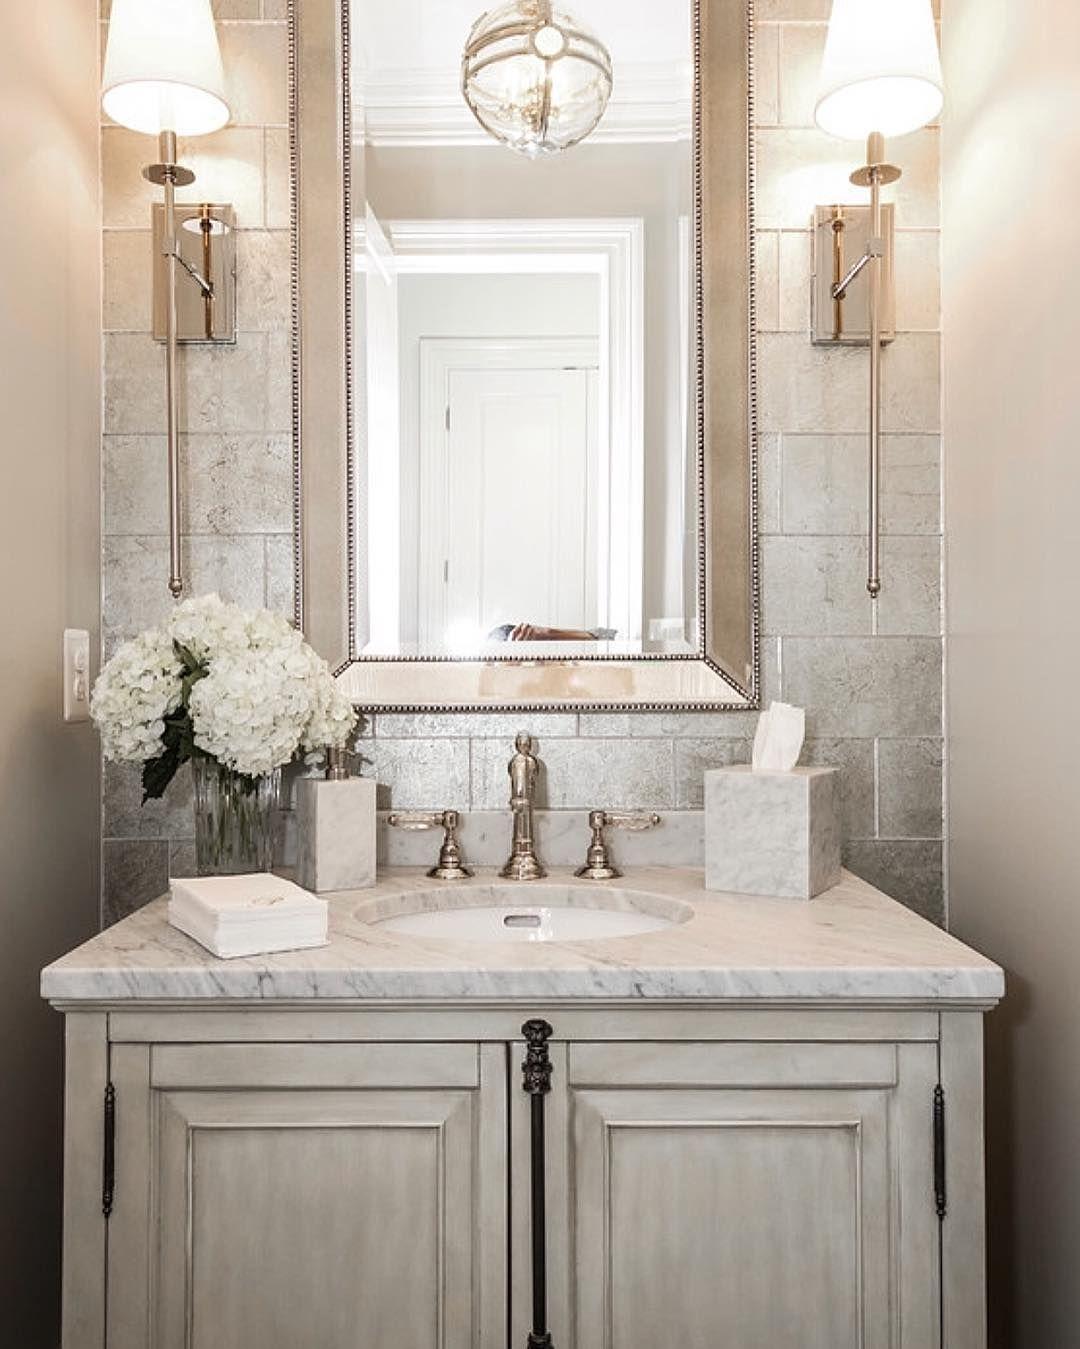 Best Kitchen Gallery: Such An Elegant Powder Room By Castlwood Custom Builders of Elegant Bathroom Designs  on rachelxblog.com